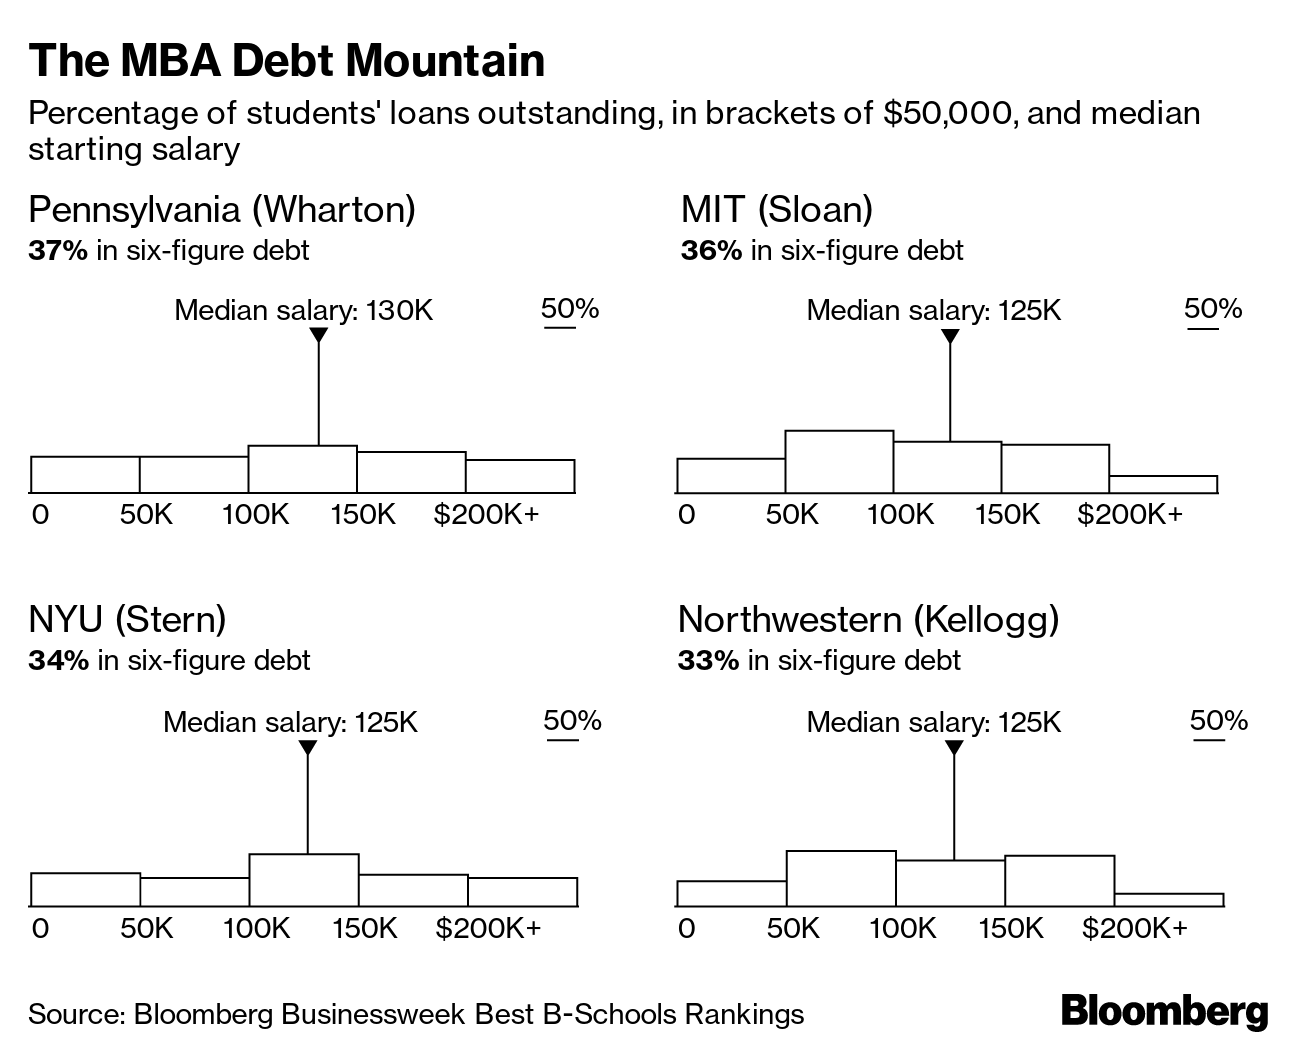 Top U S  B-School Students Pile on Debt to Earn MBAs - Bloomberg